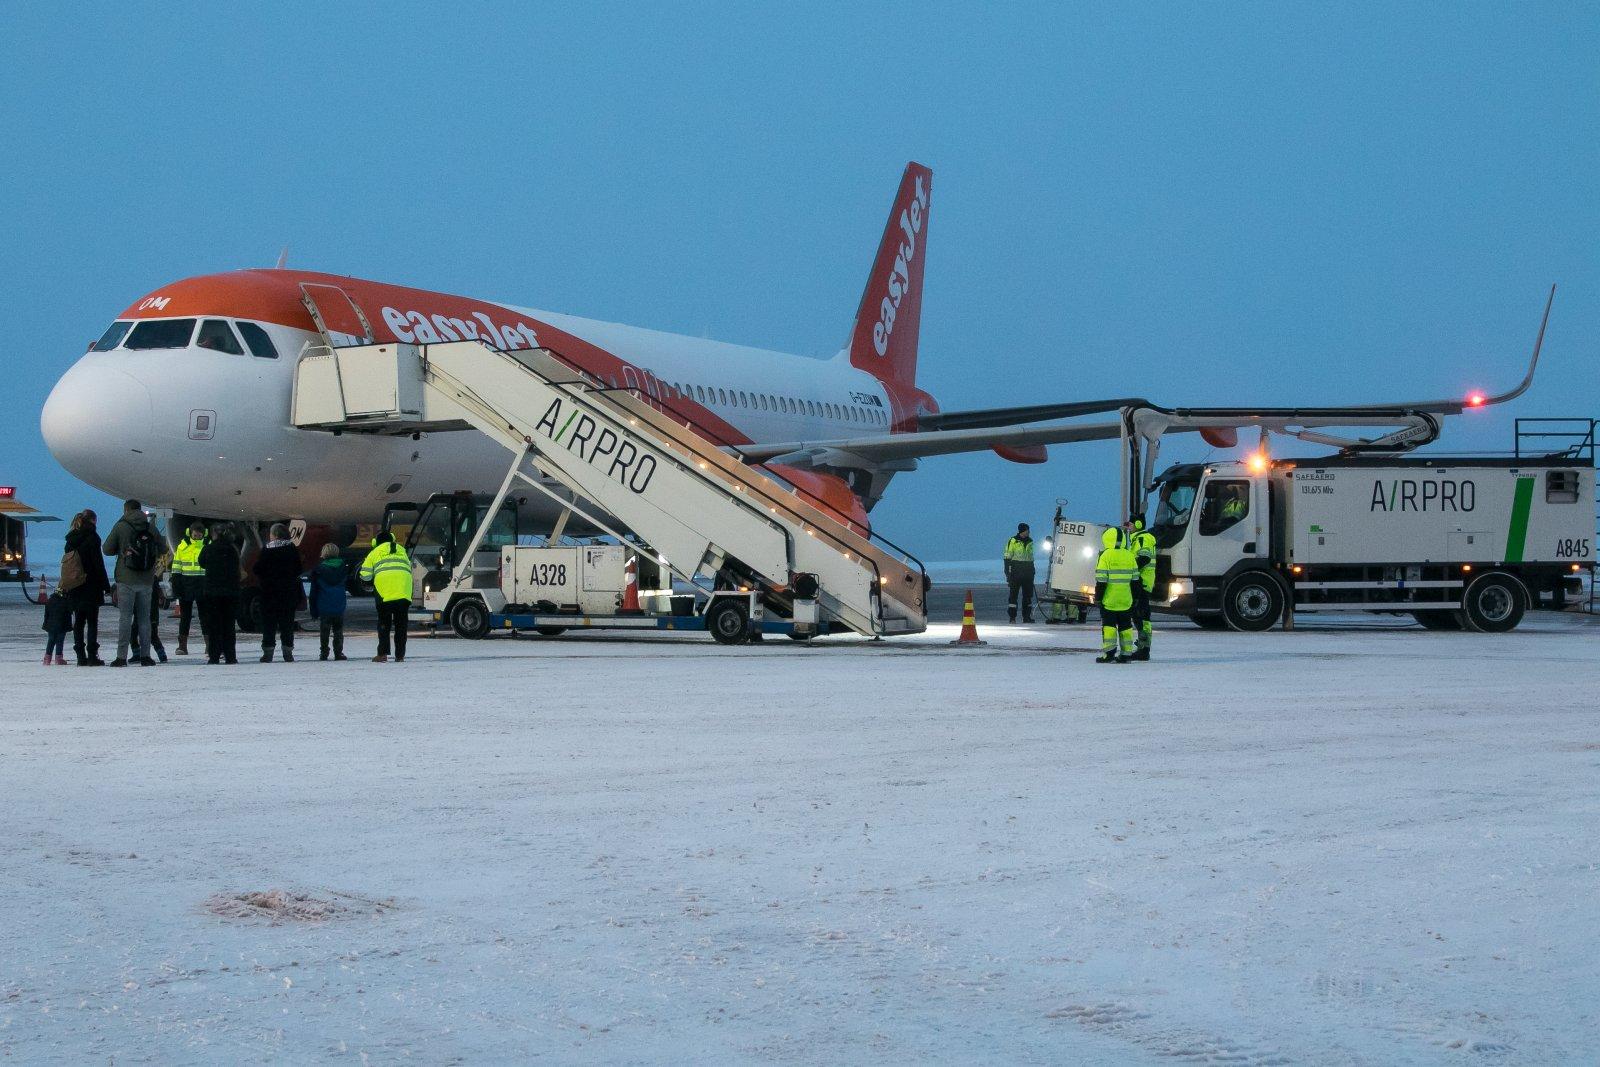 G-EZOM. 20.12.2019. Päivän easyJet, Airbus A320-214